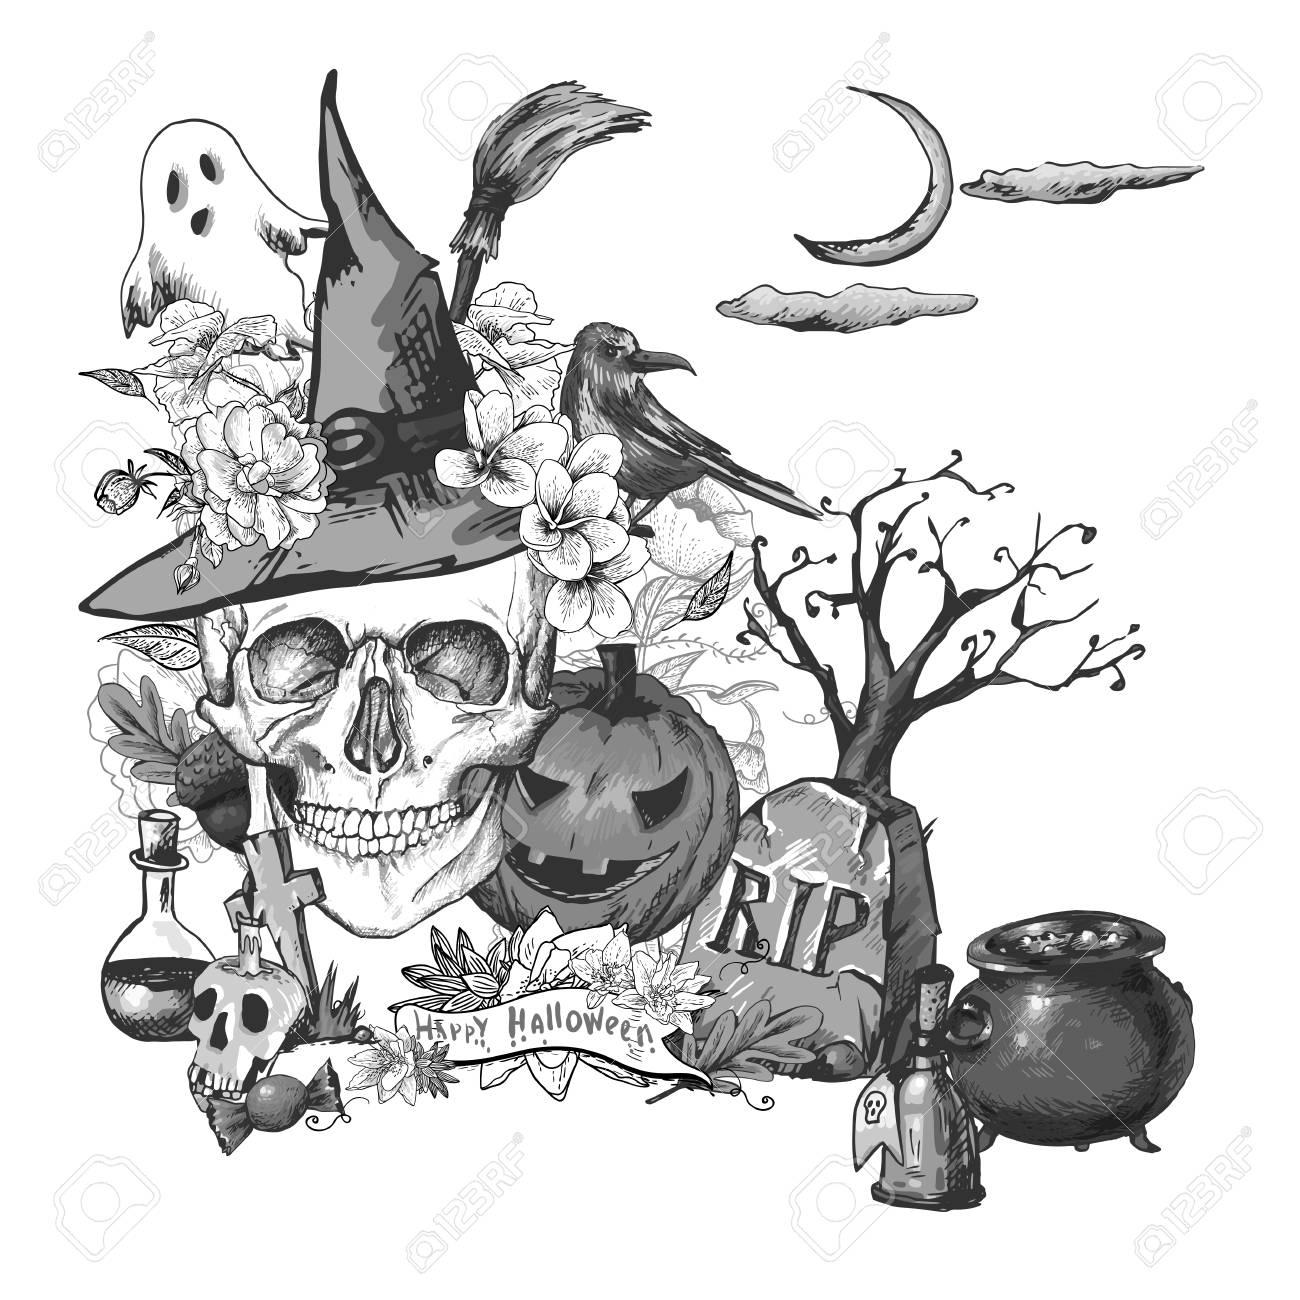 Halloween Vintage Clipart.Black And White Vintage Hand Drawn Halloween Invitation Card